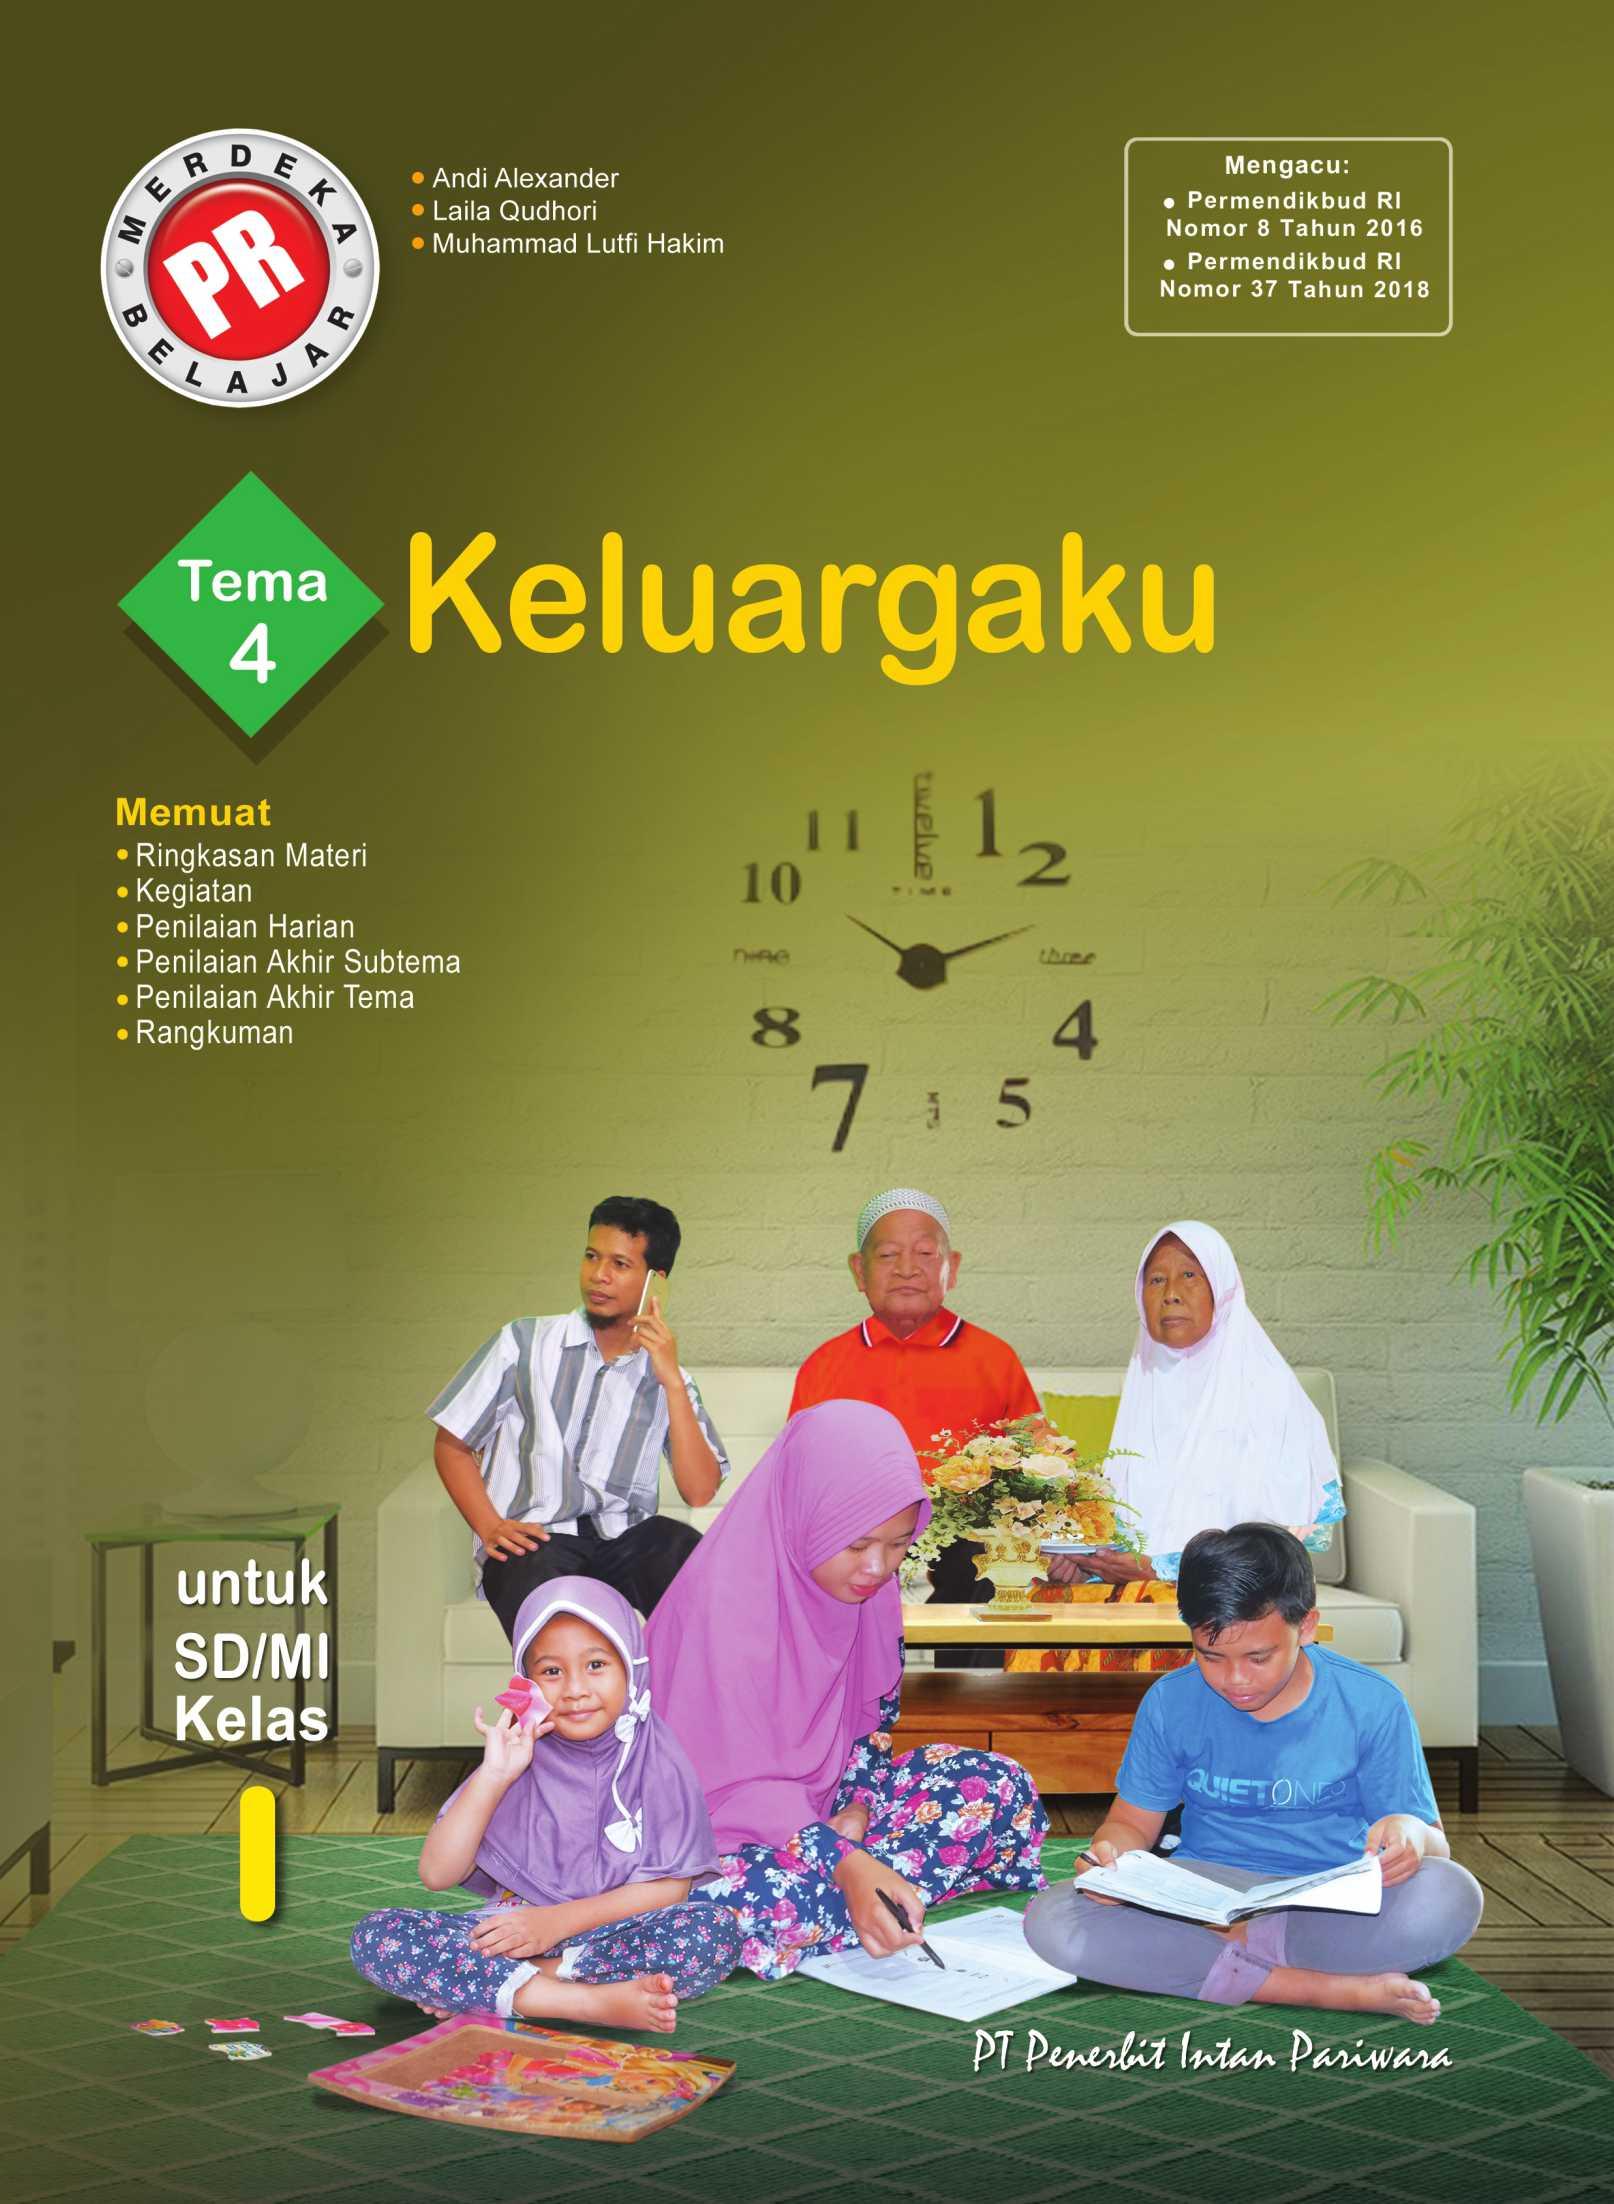 PR Kelas I Tema 4 Keluargaku Thn 2020/2021